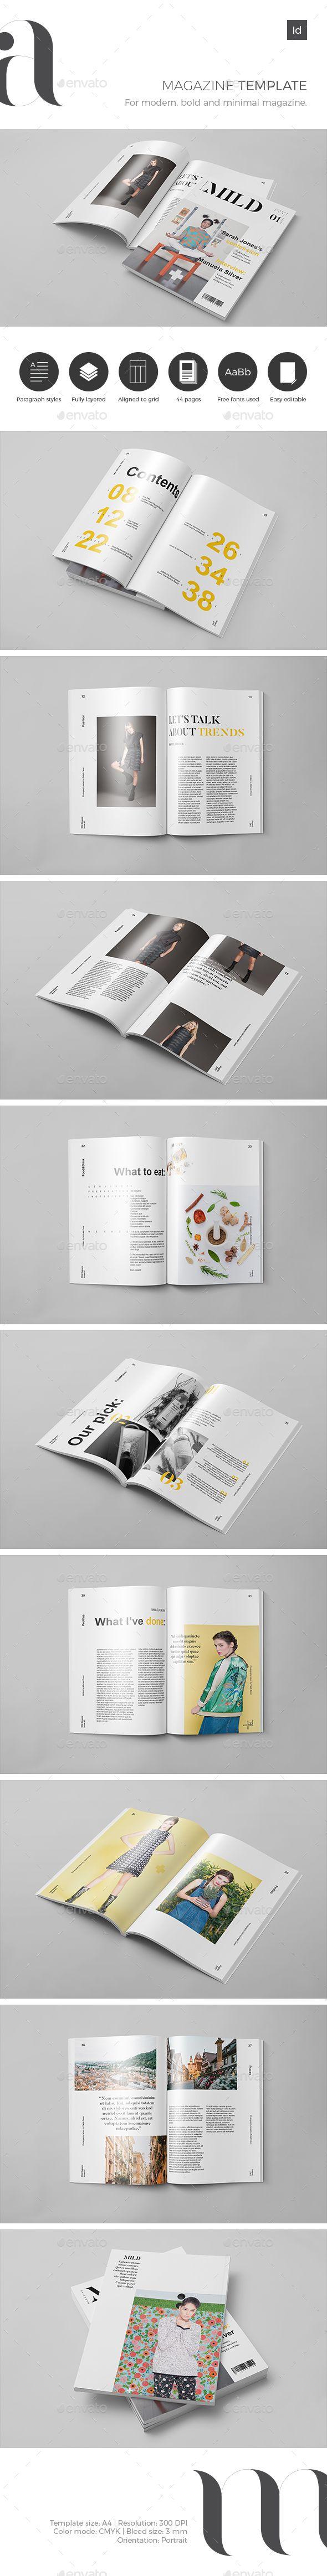 Mild Magazine Template